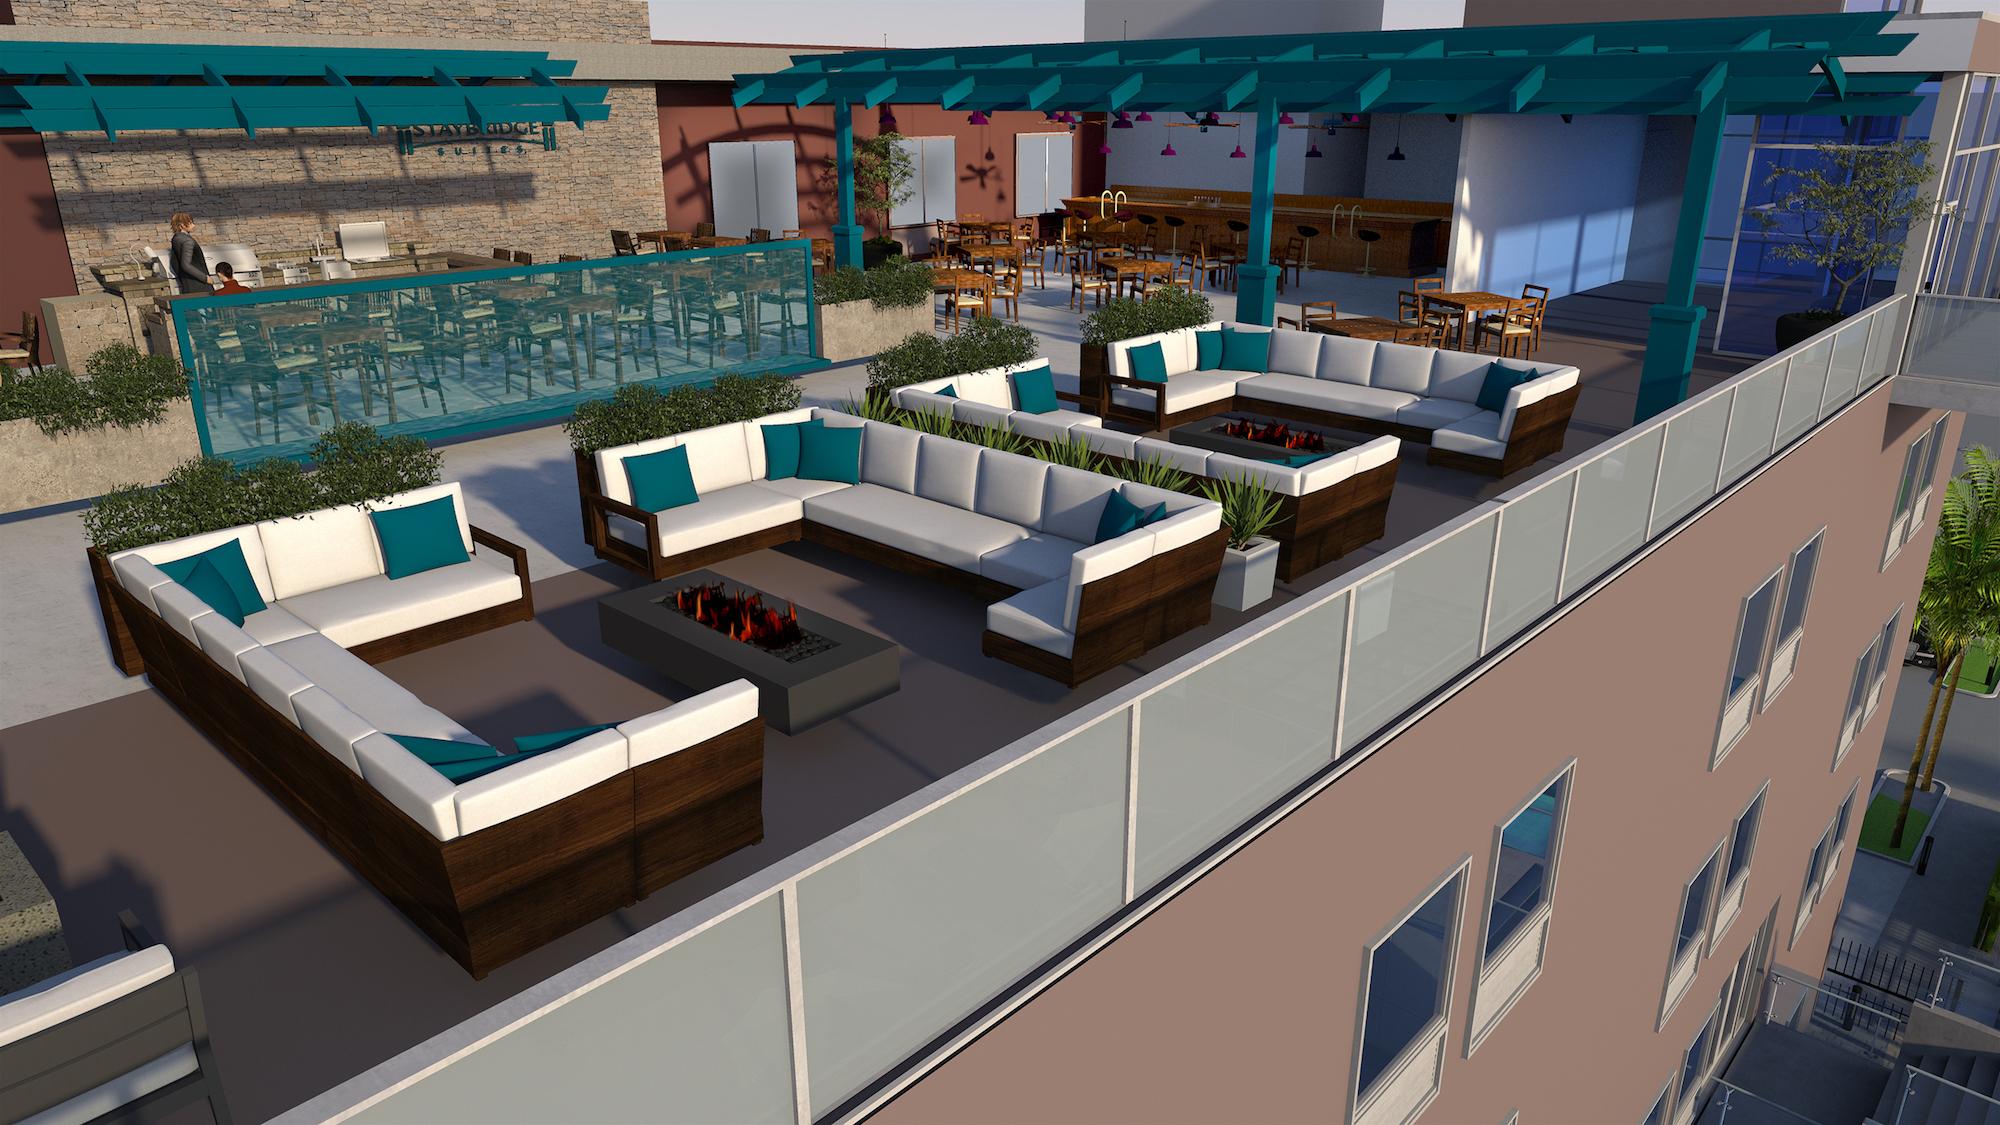 Staybridge RoofTop bar 2500.jpg